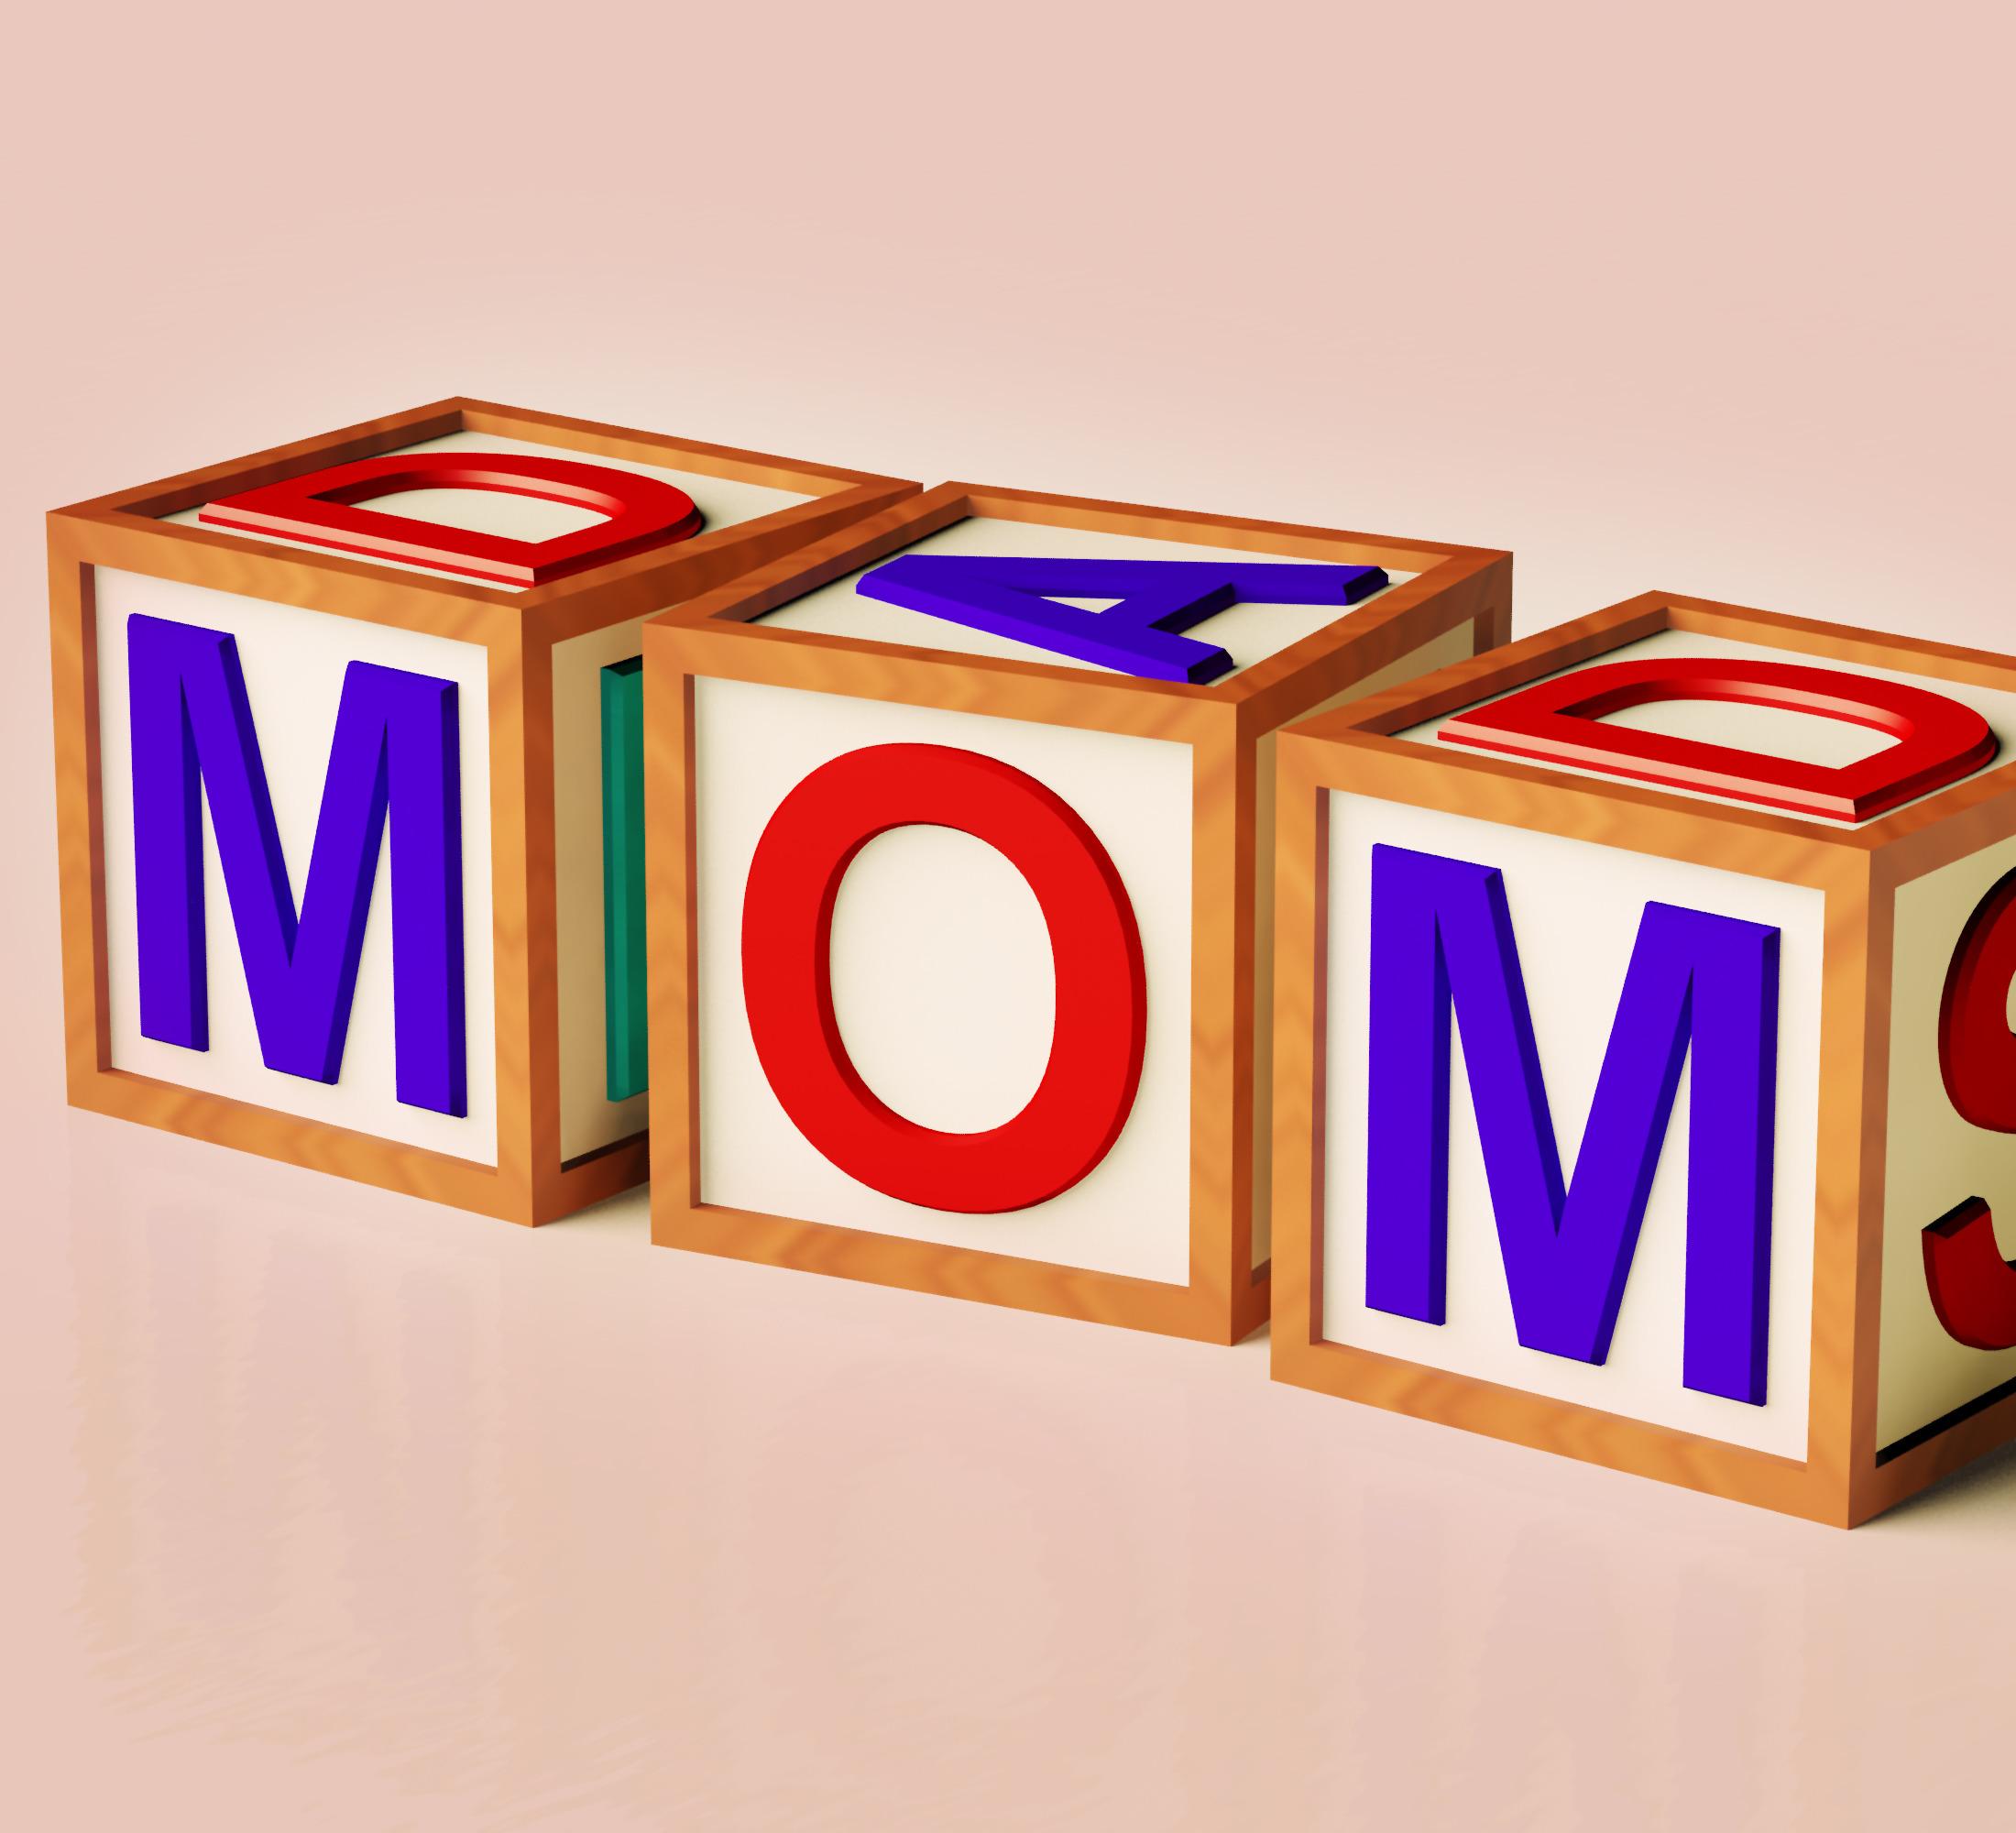 Kids Blocks Spelling Mom As Symbol for Motherhood And Parenting